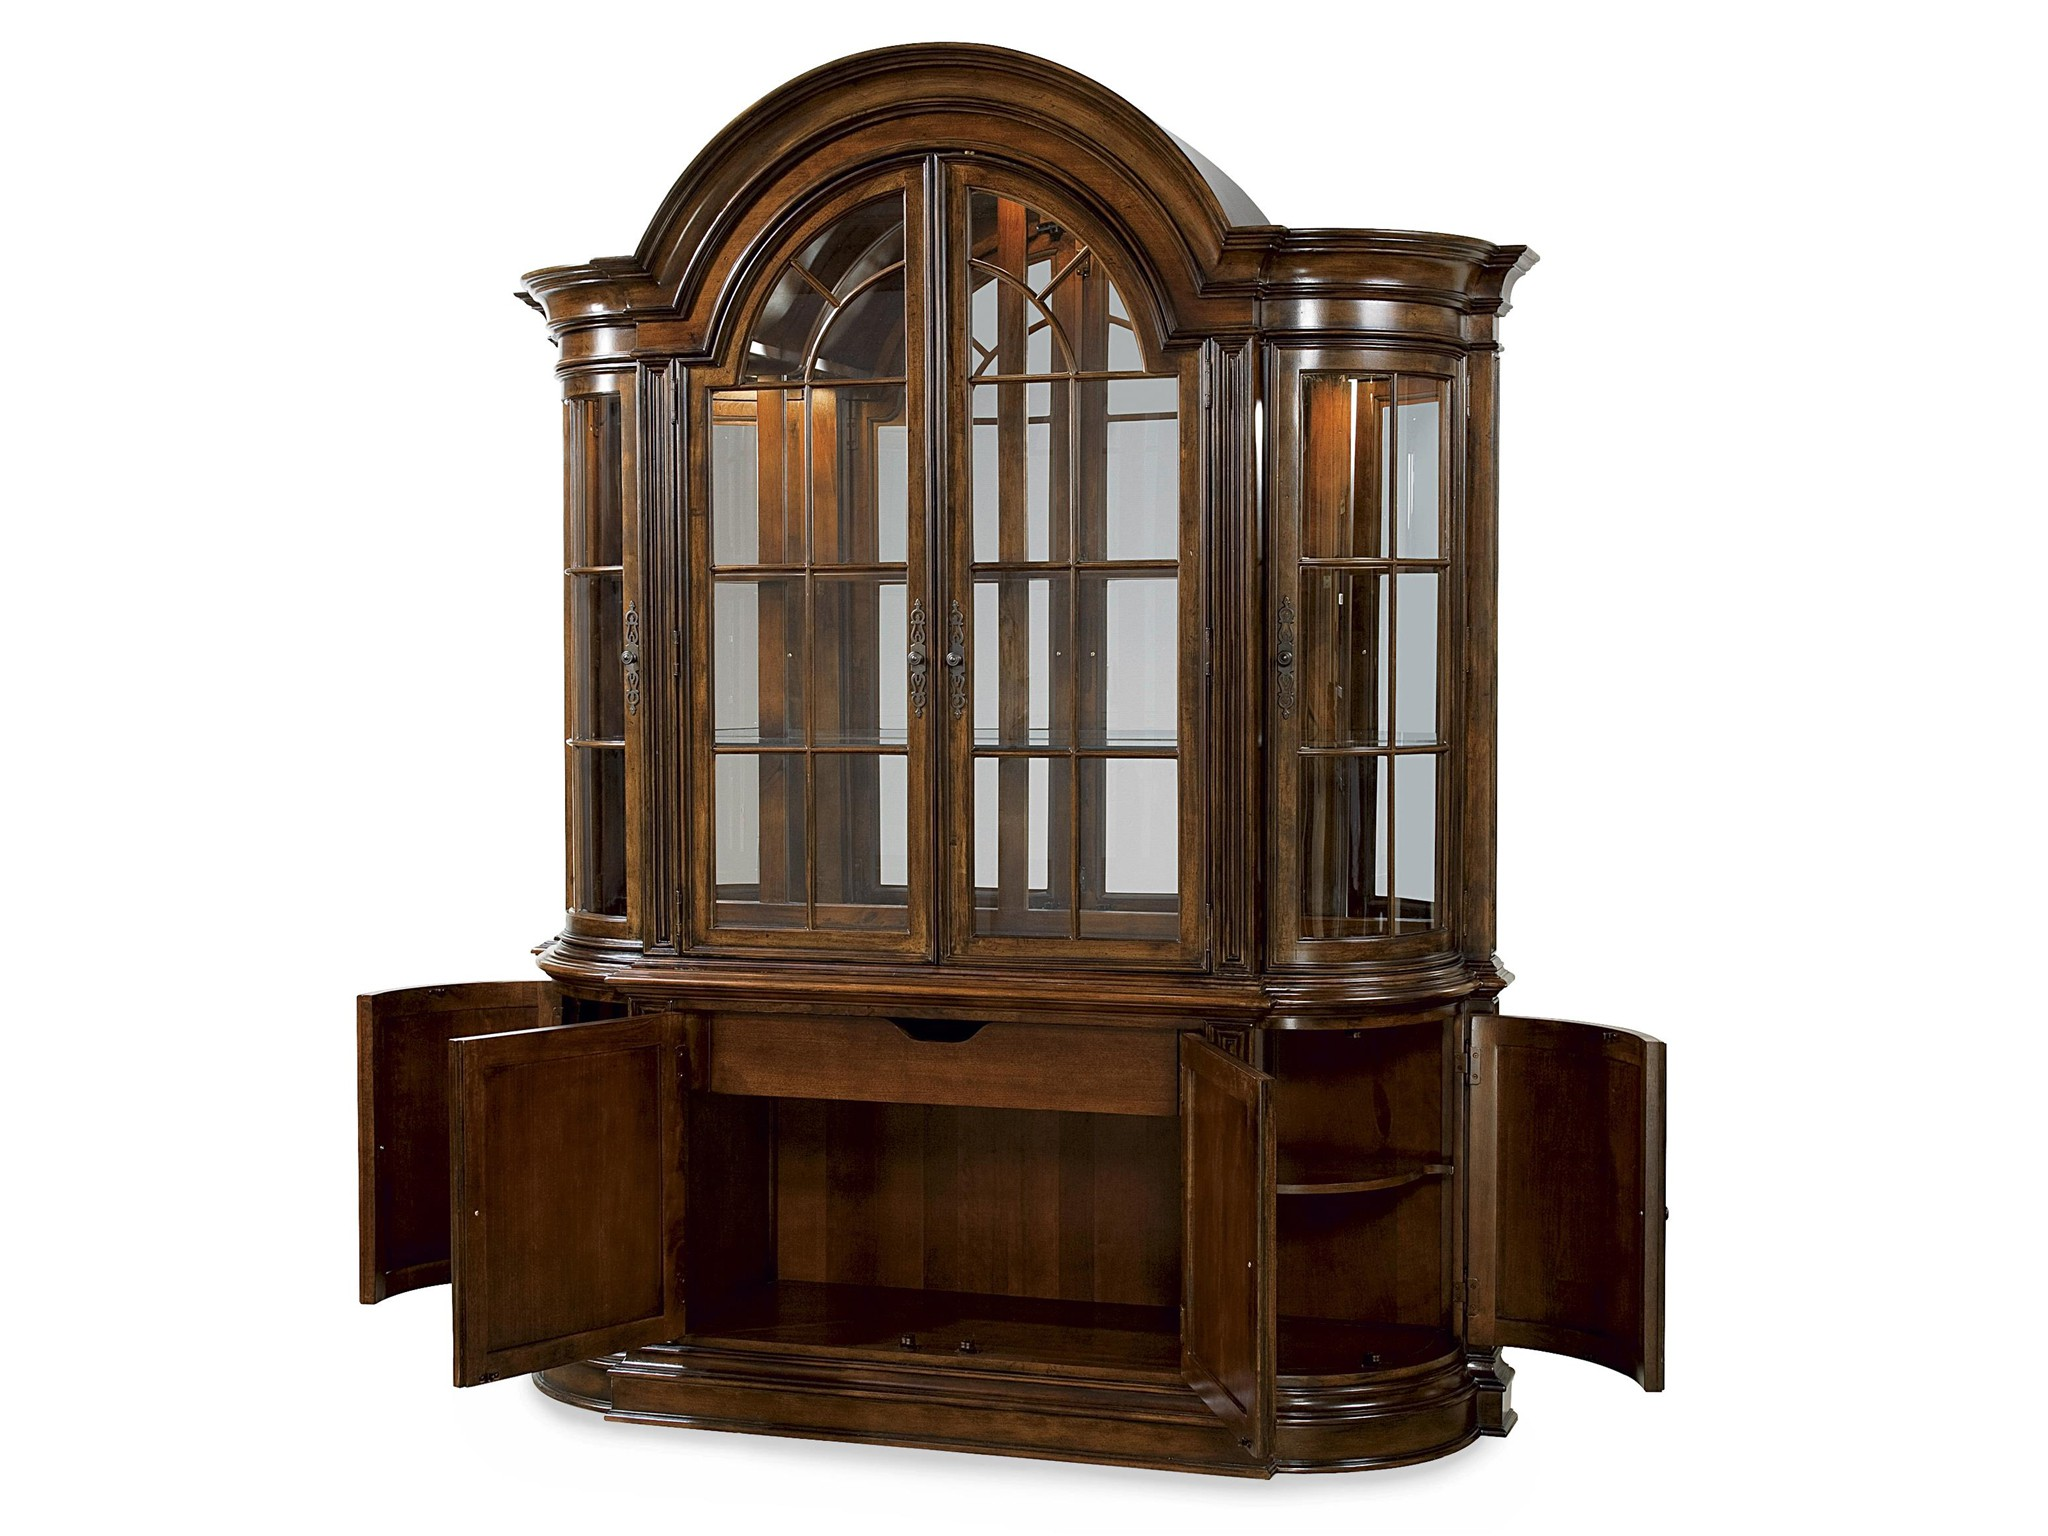 Universal Furniture Villa Cortina Sideboard